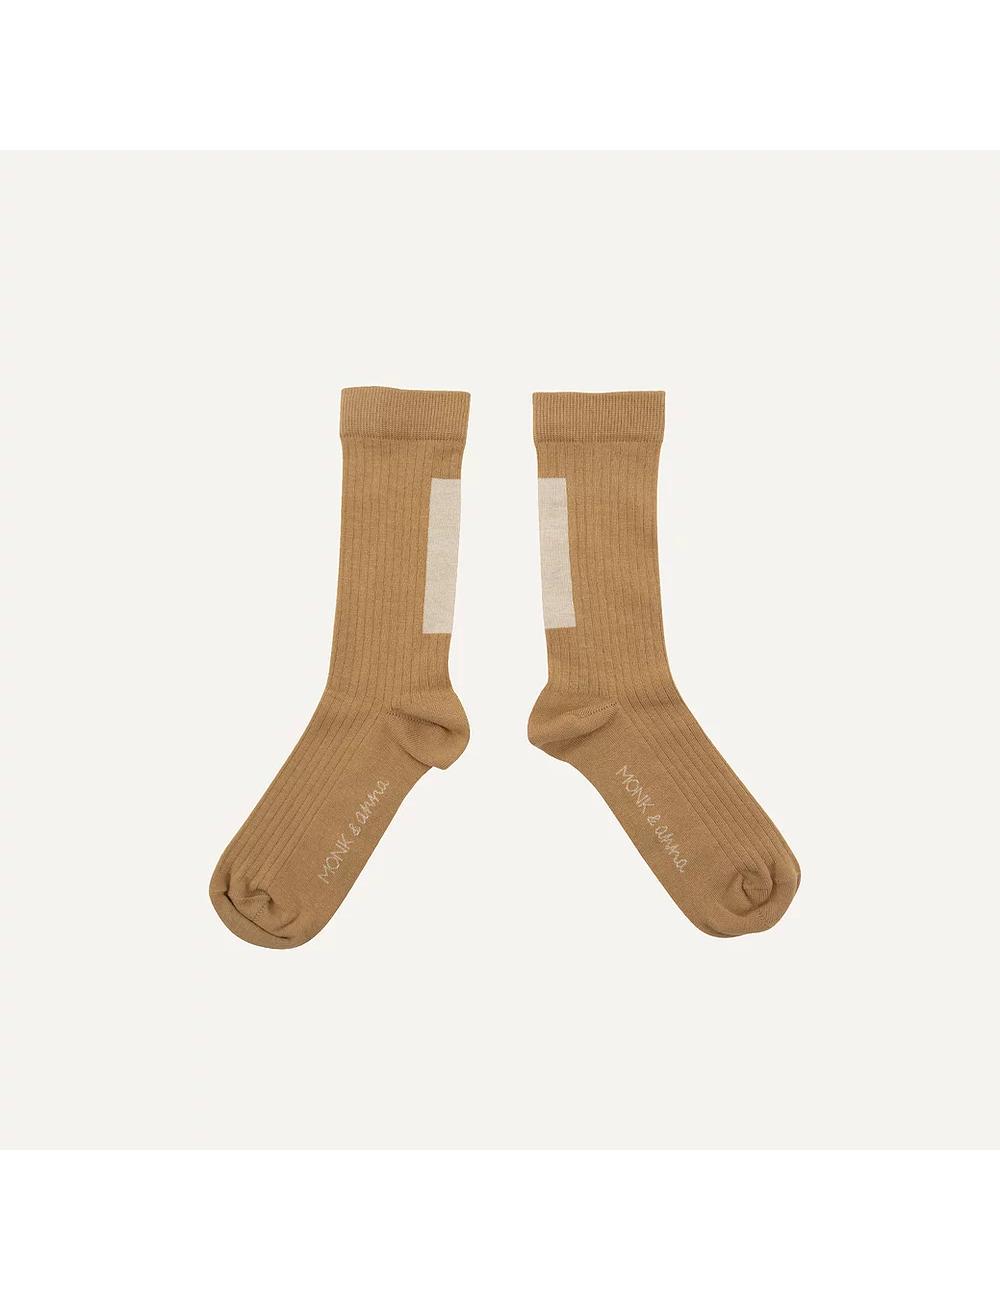 Sokken Graphic Shape | wheat & milk